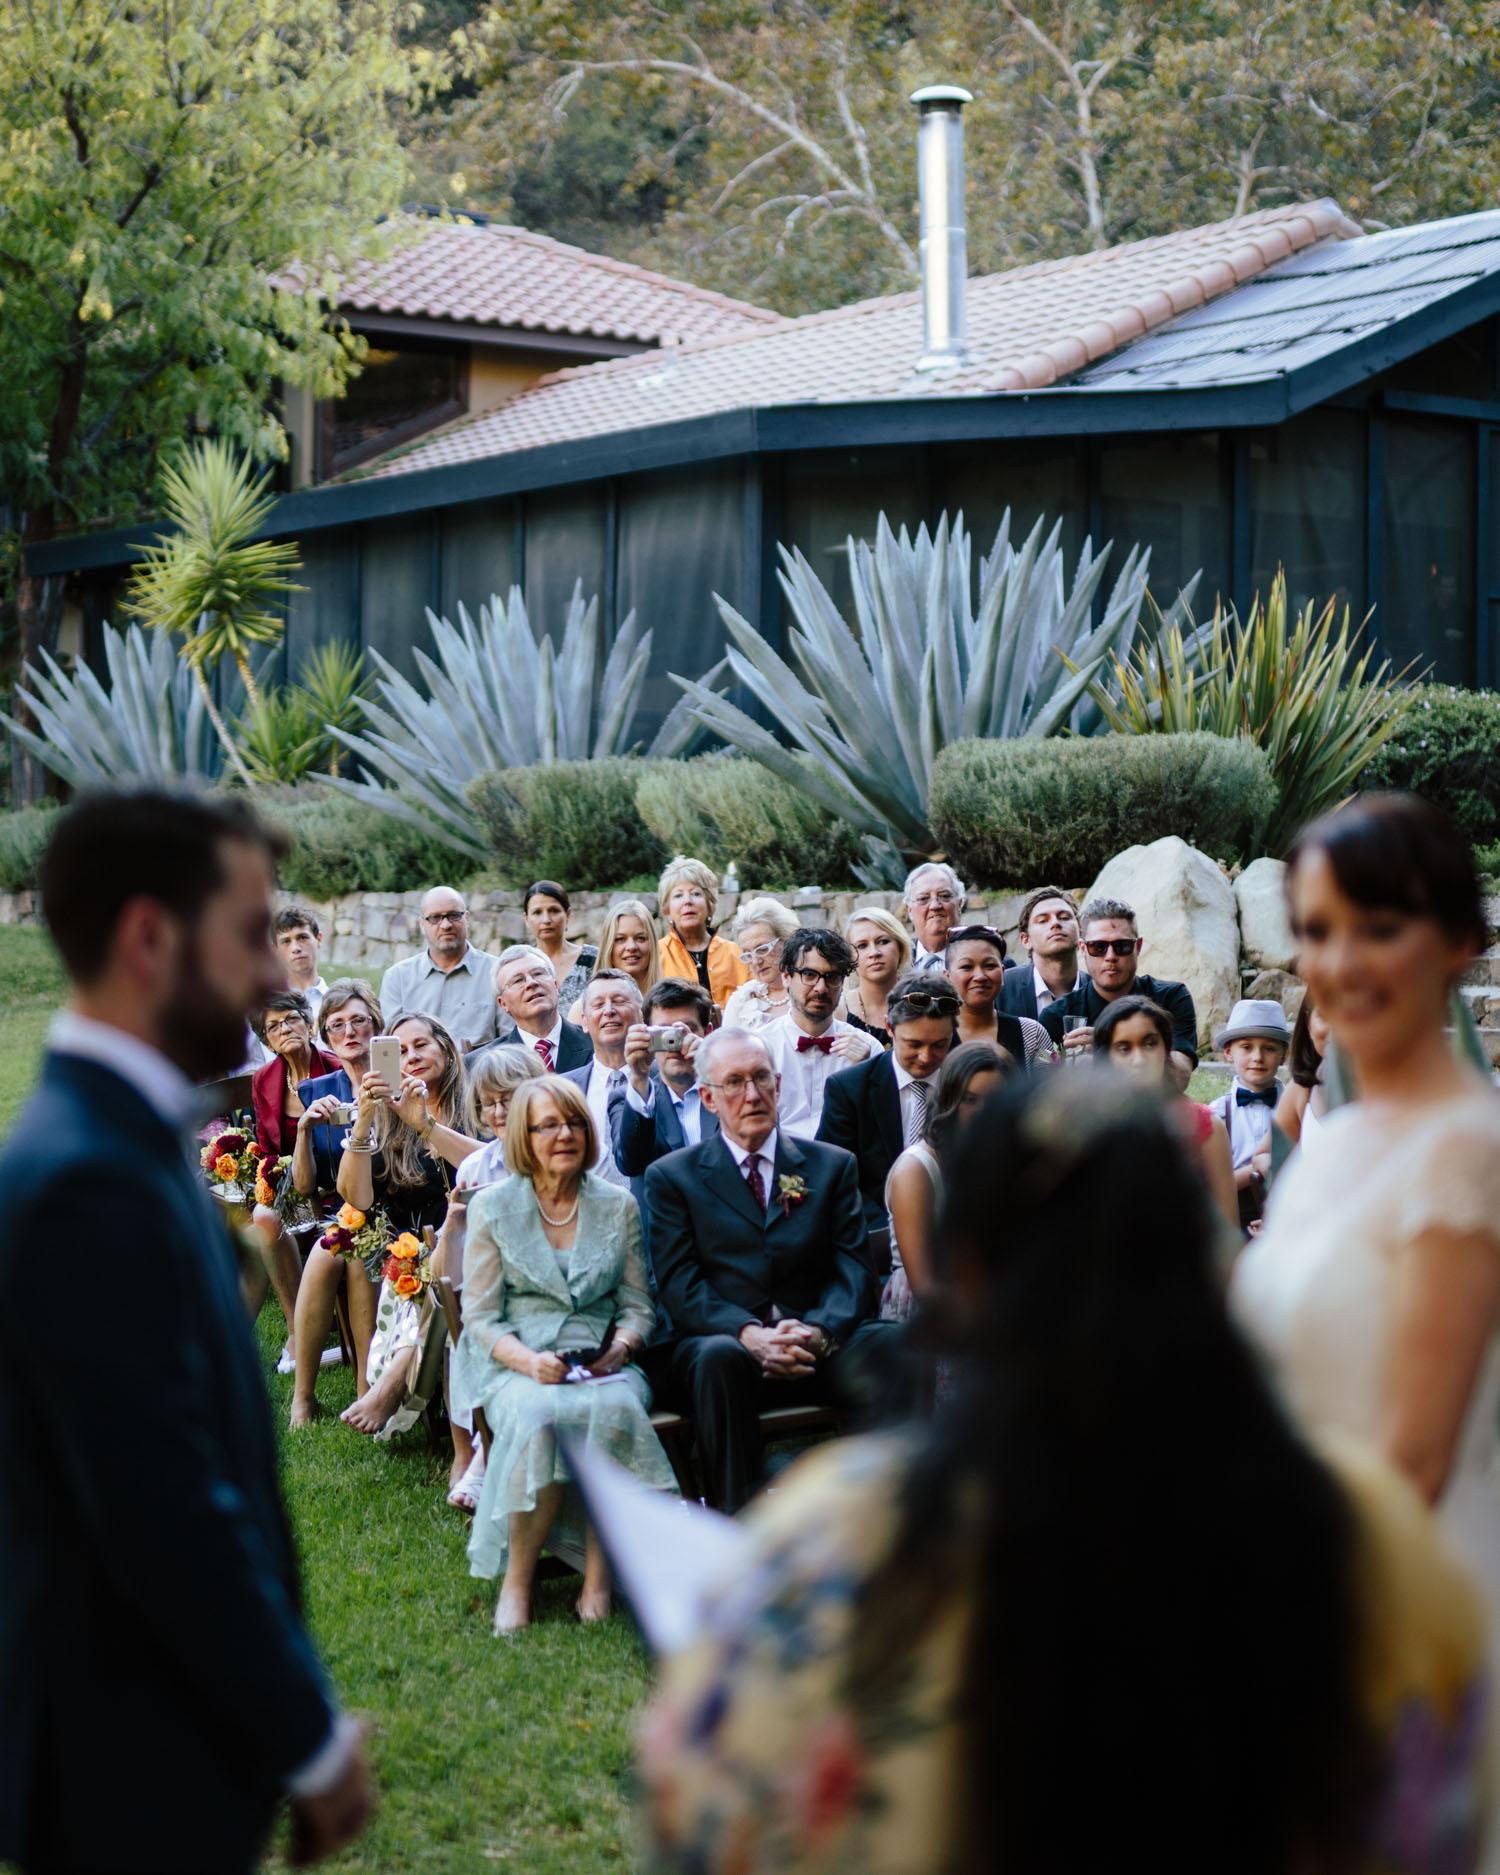 Ojai Wedding Photographer, Calliote Canyon Wedding - The Gathering Season x weareleoandkat 037.JPG